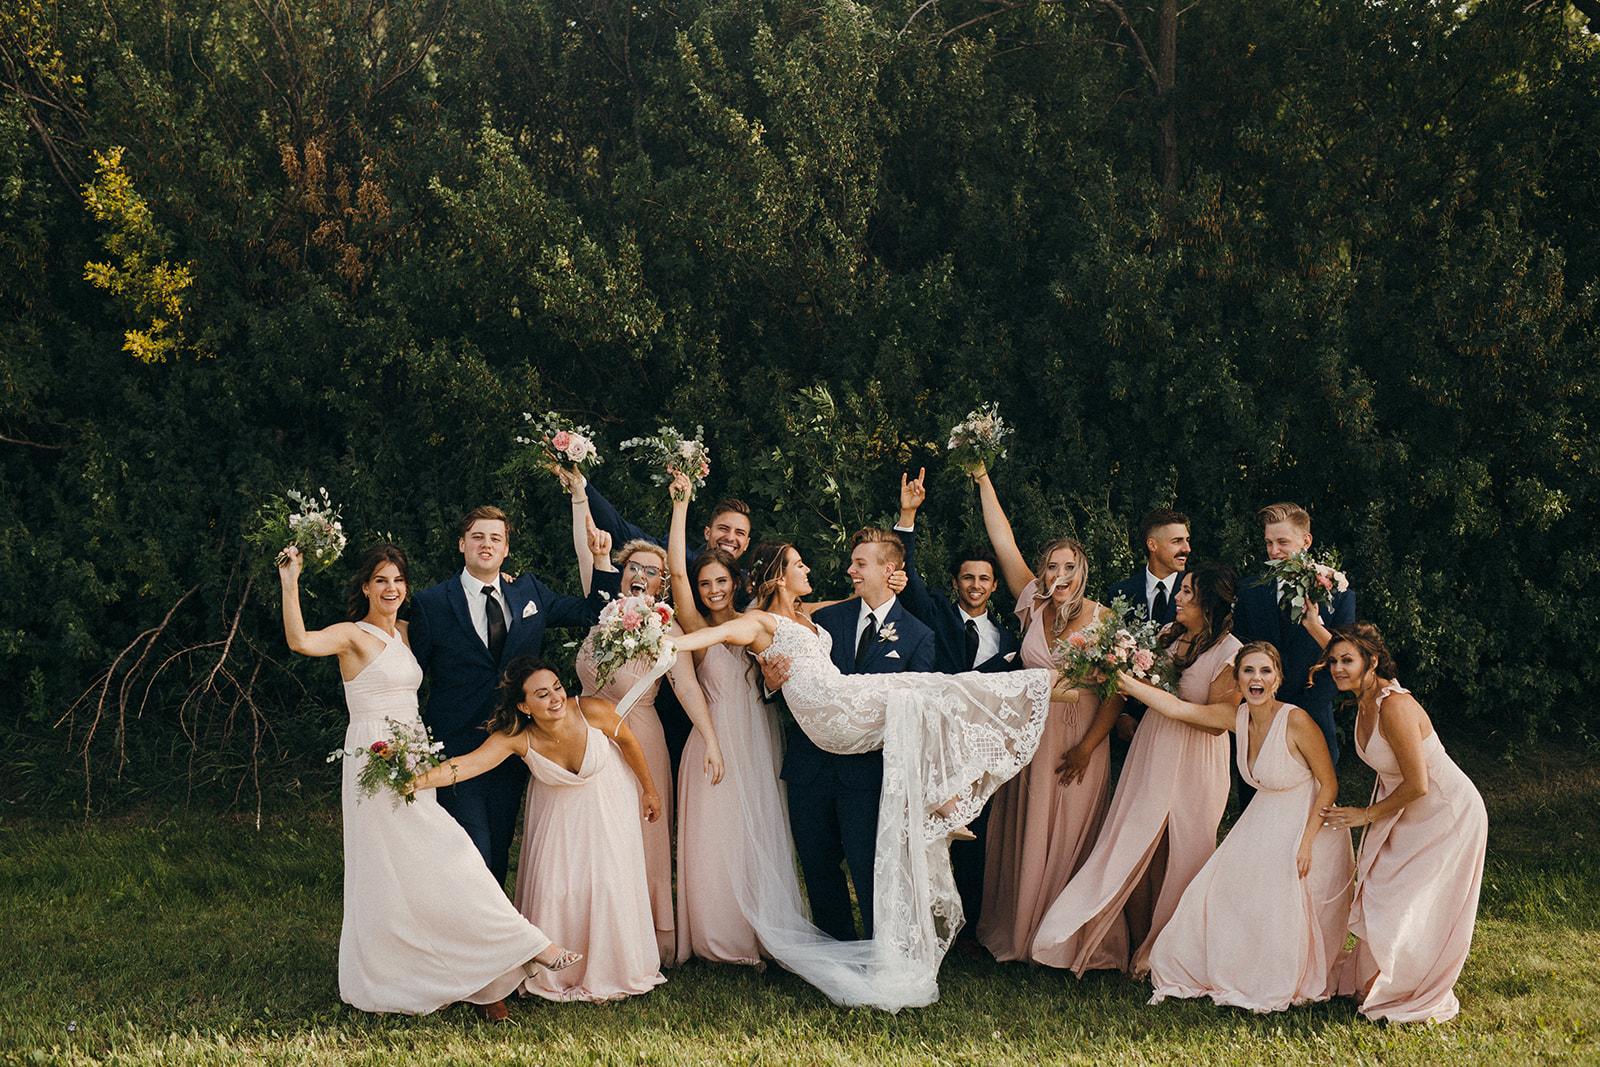 kaden_justine_wedding_2024.jpg